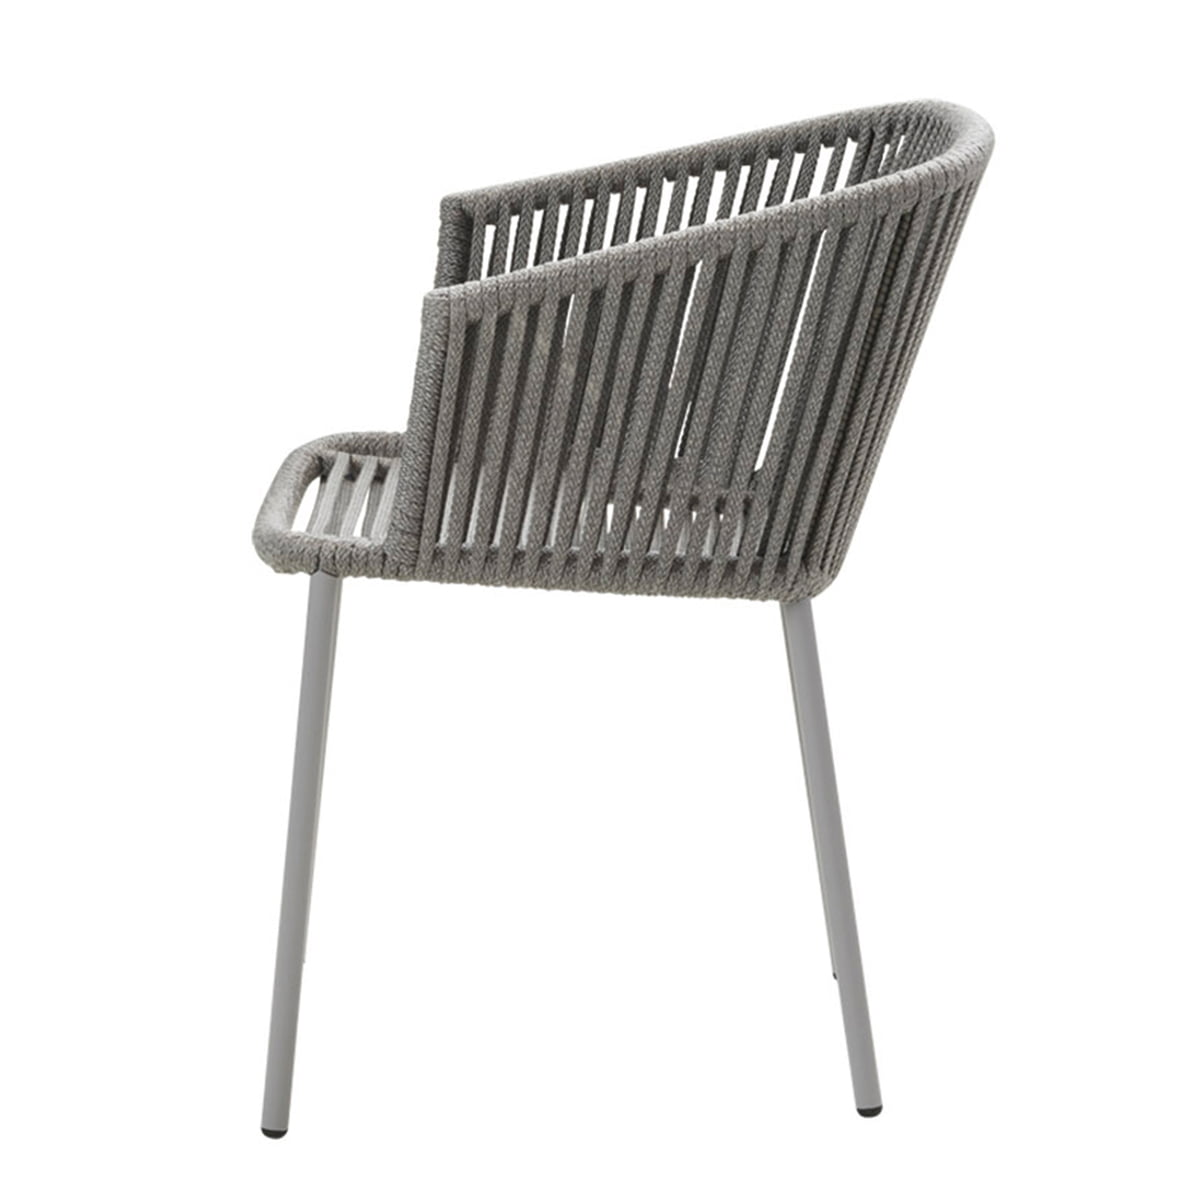 Cane-line - Moments Stuhl mit Armlehne (7440), Stapelbar, grau